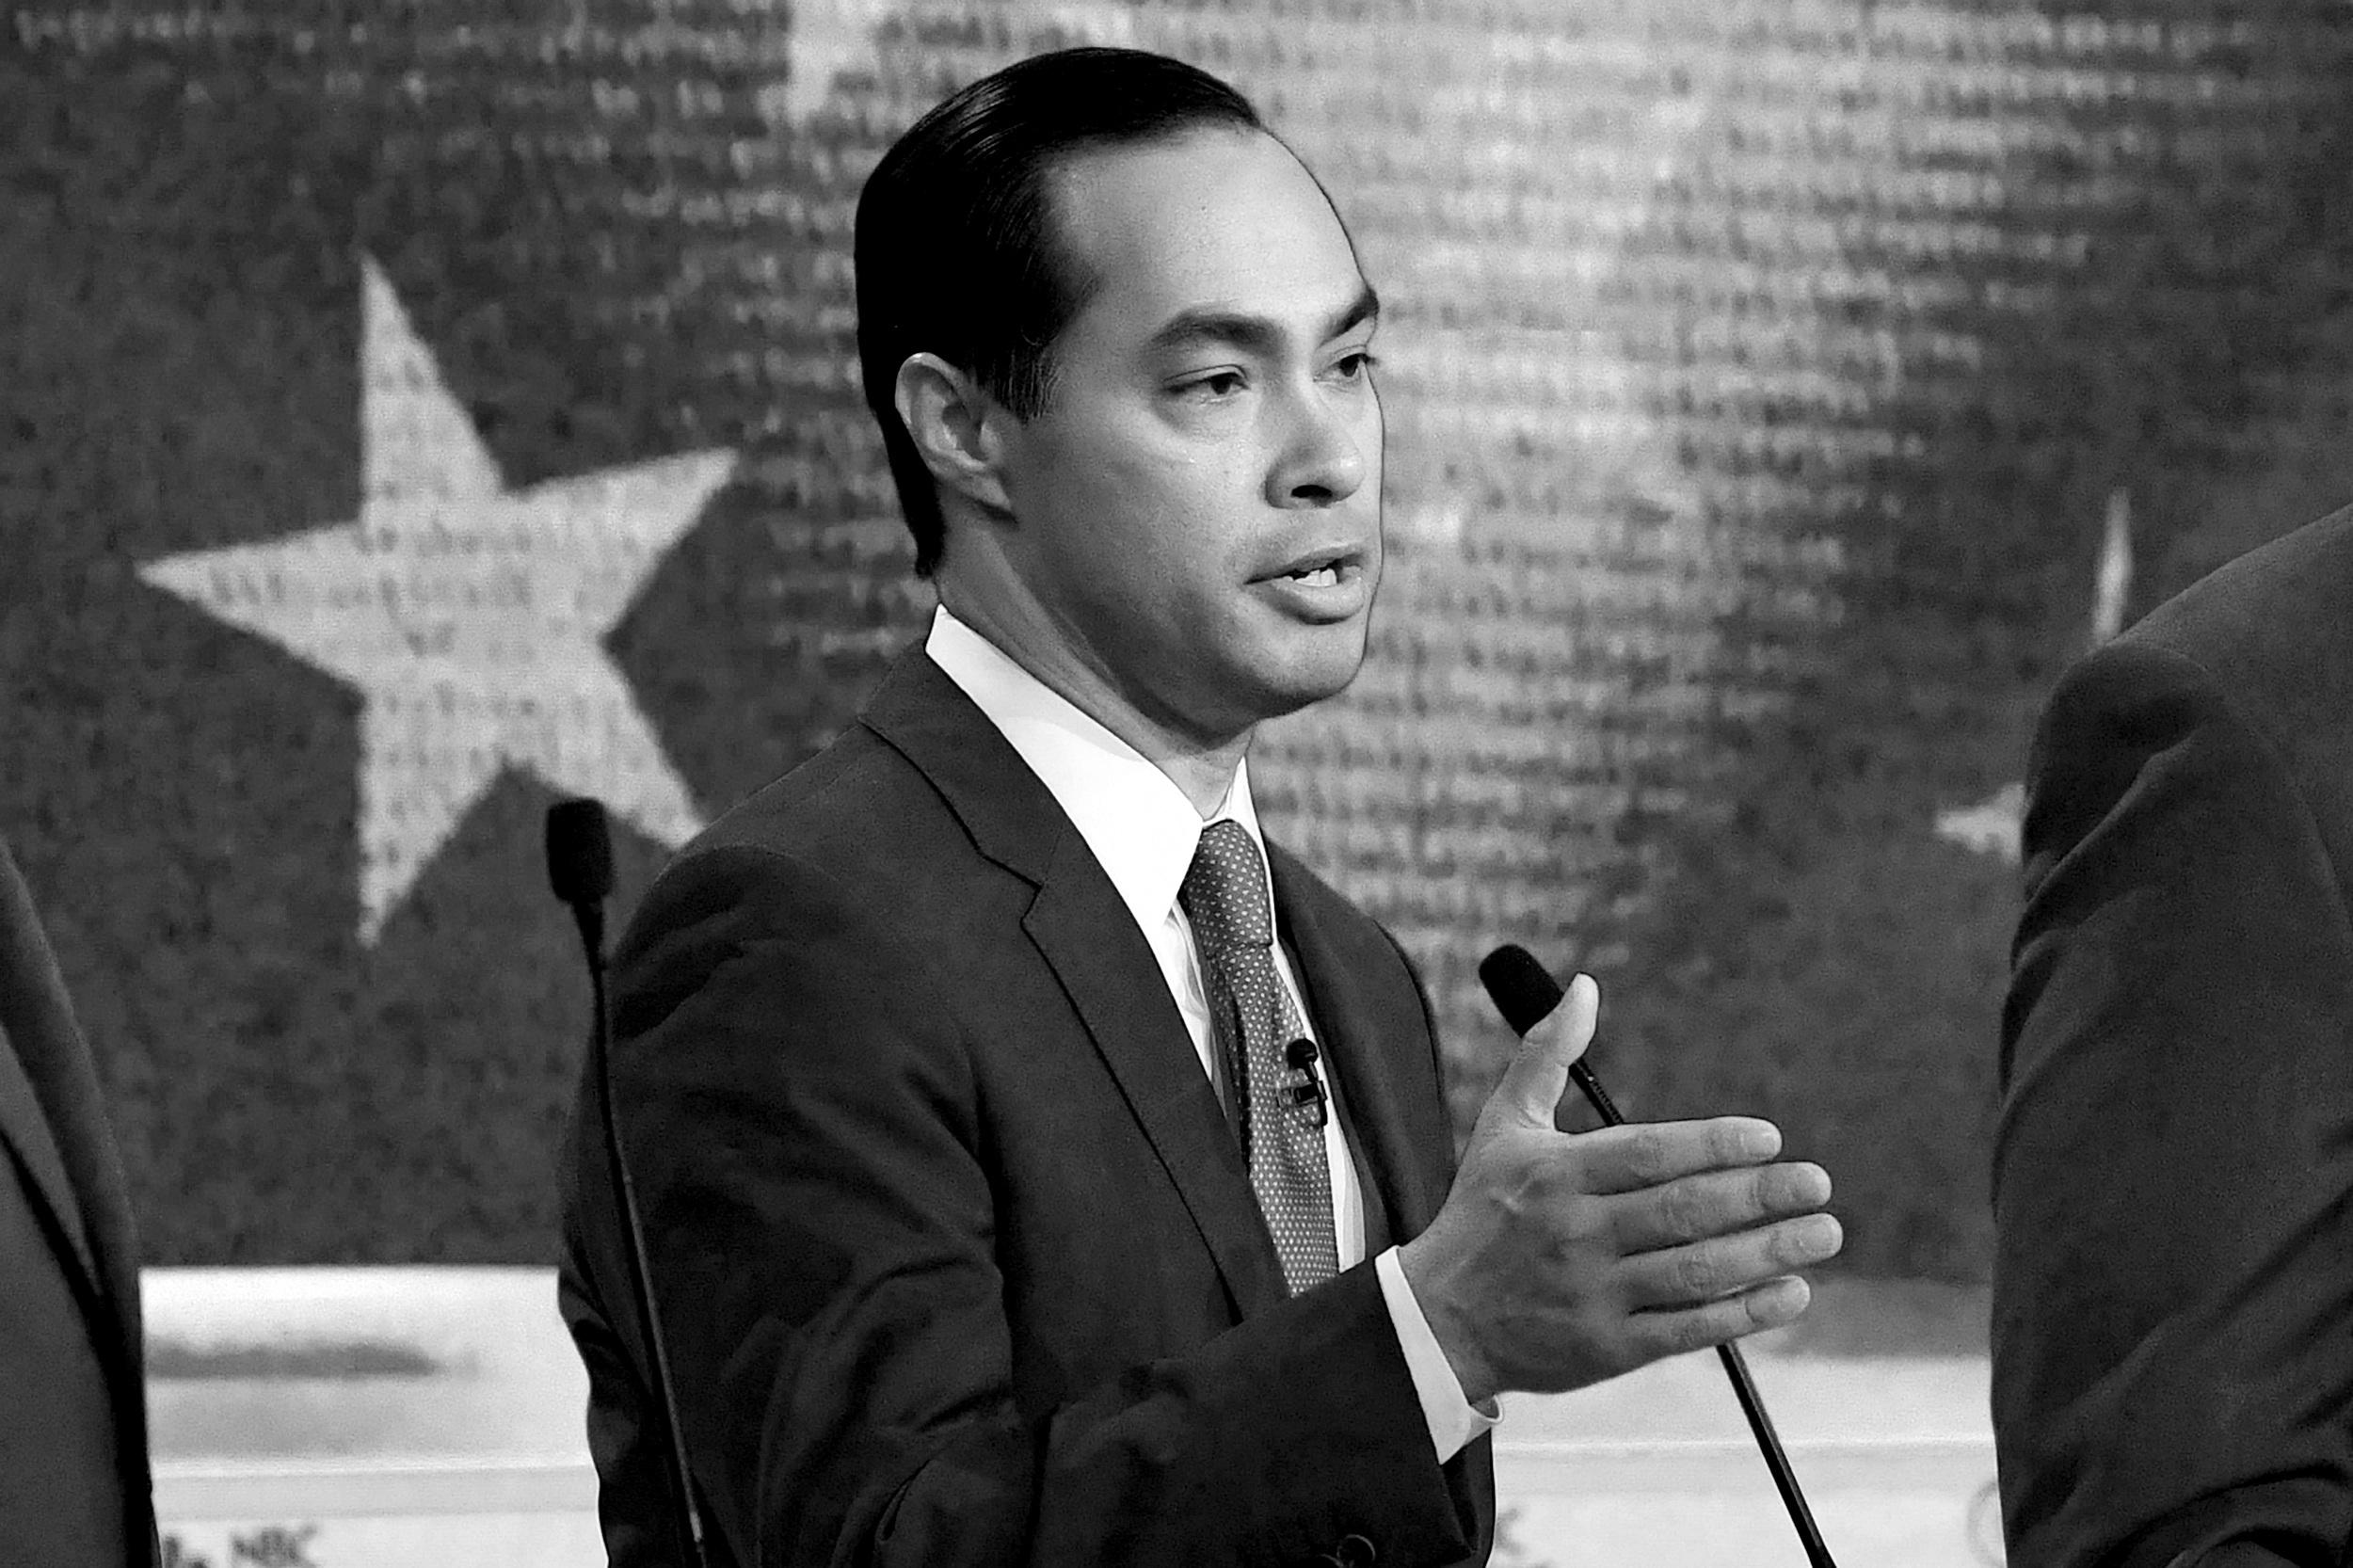 Secretary Julián Castro - Former Mayor of San Antonio and former Secretary for Housing and Urban Development